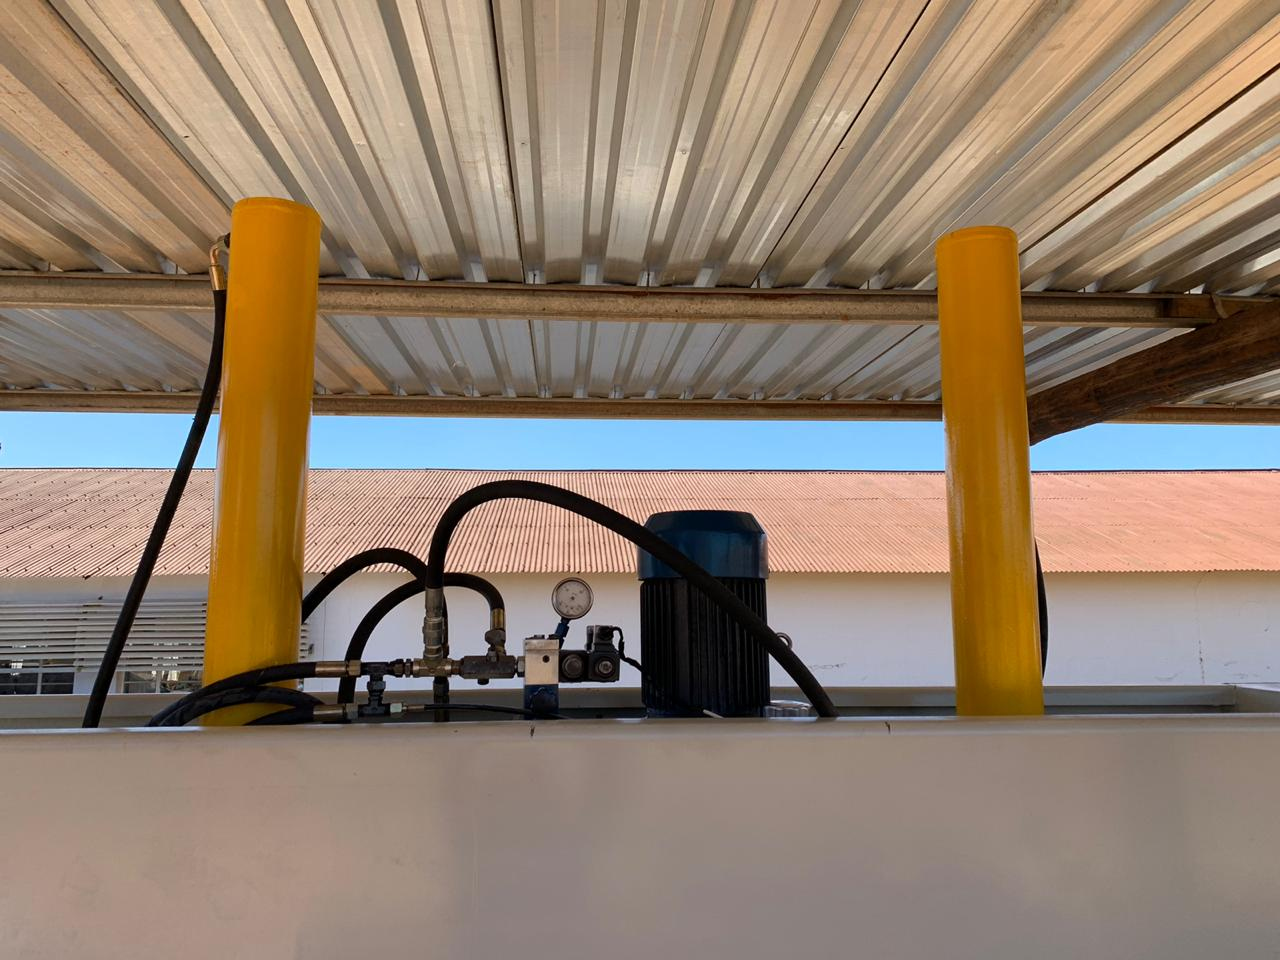 Cold Press, ROOSMAC, 3600x1300mm, Hydraulic, 75Ton, 4kW